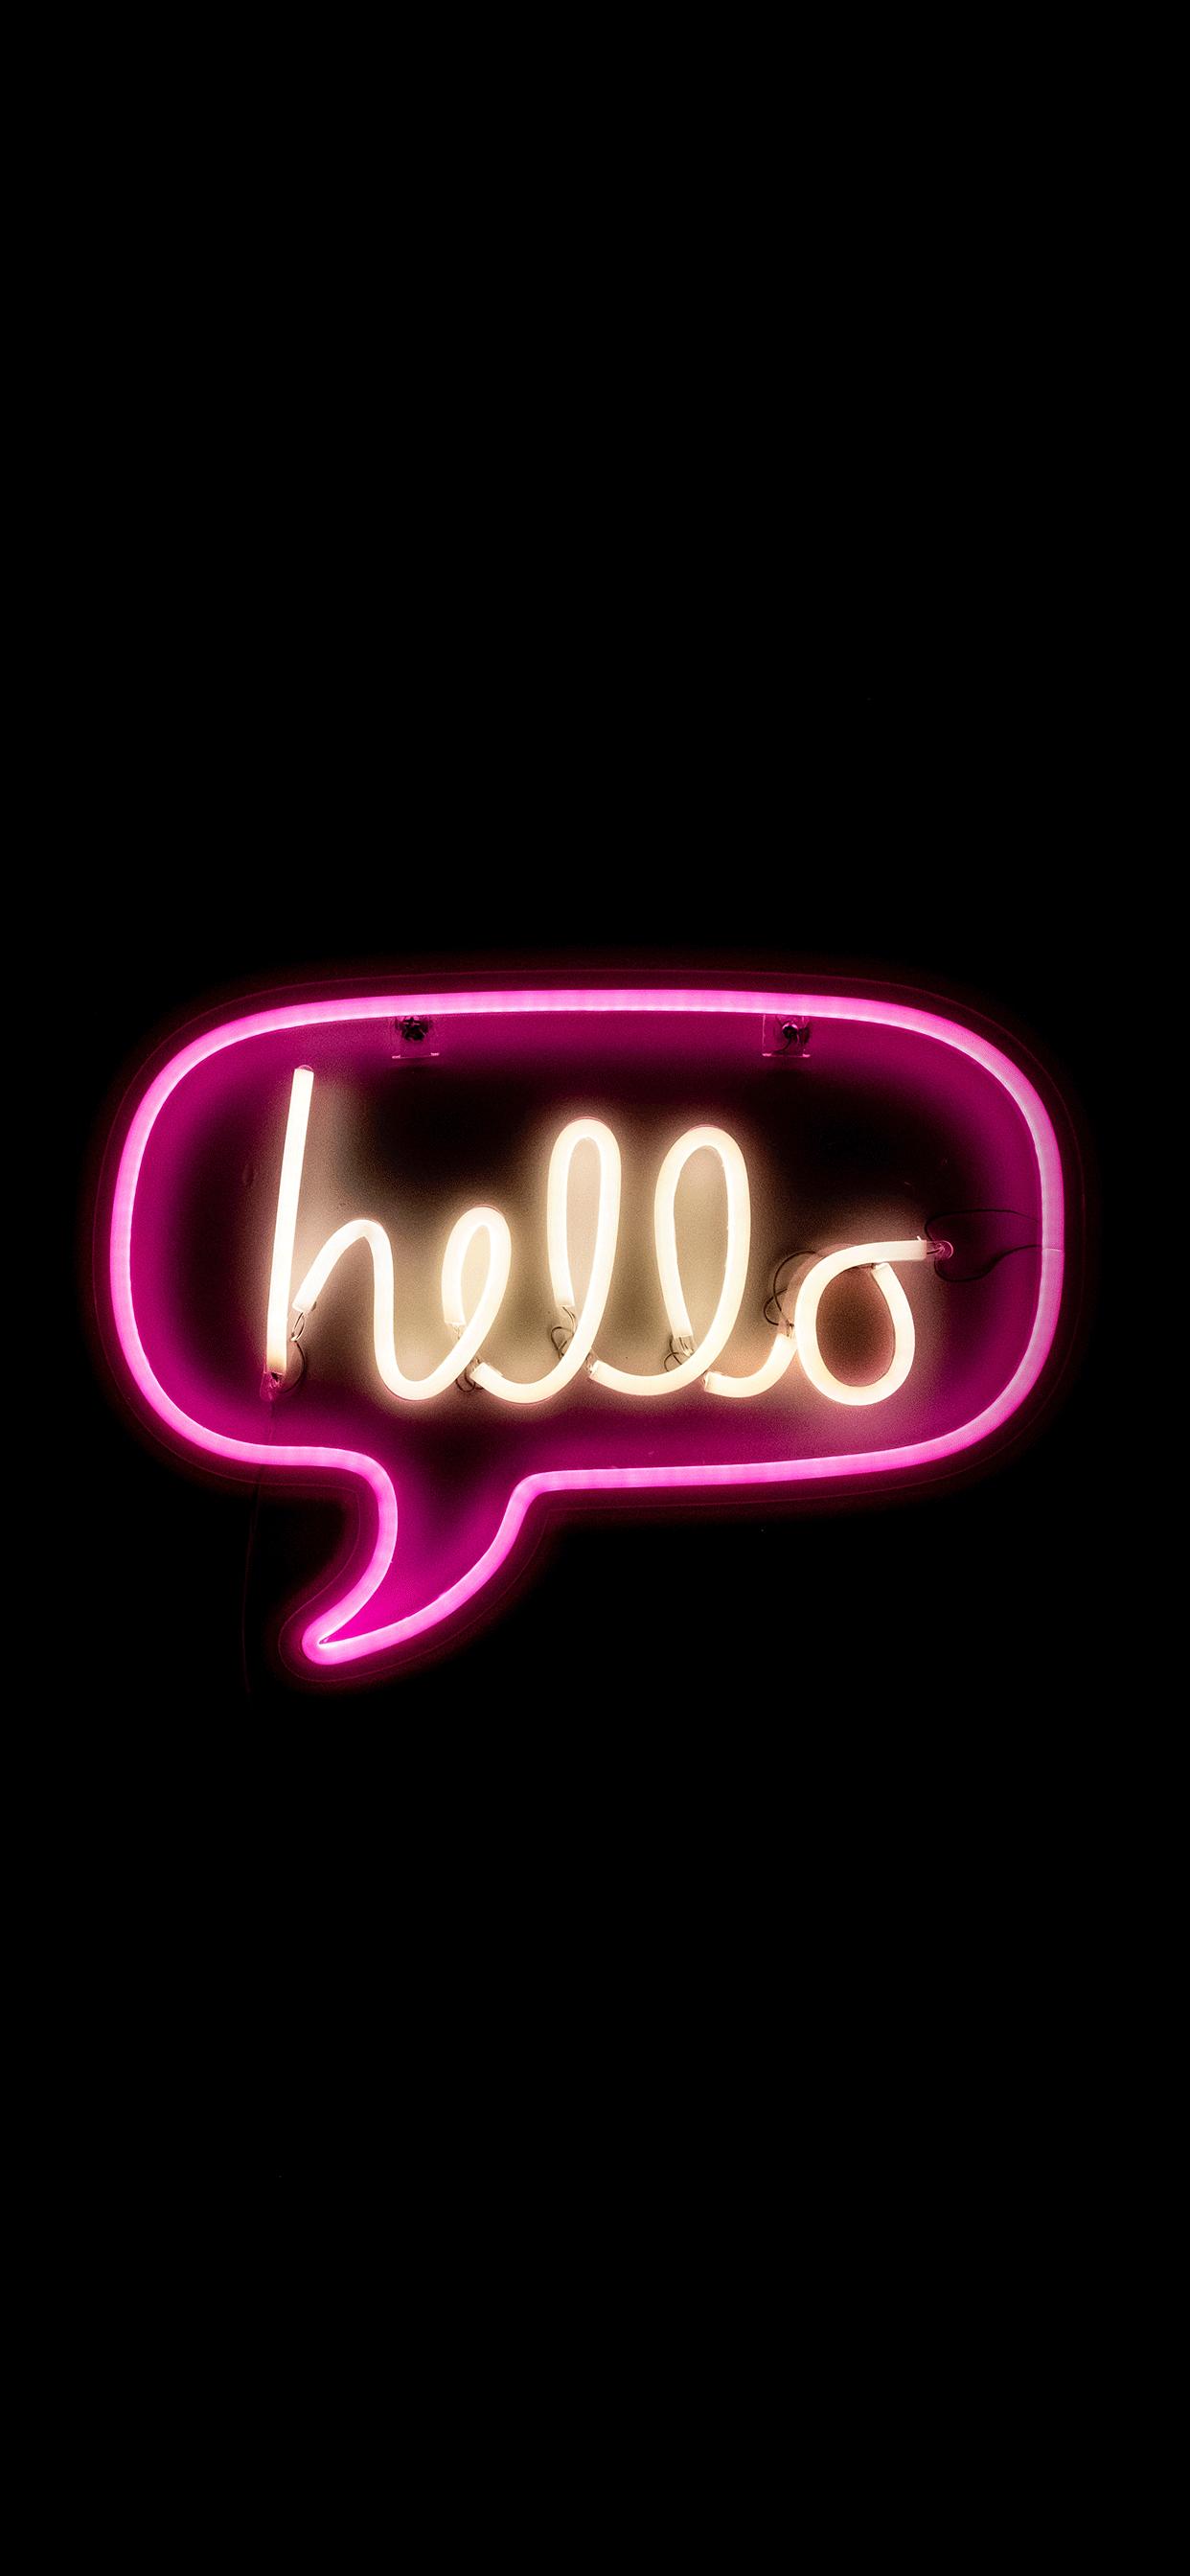 iPhone wallpapers neon hello Fonds d'écran iPhone du 23/05/2019